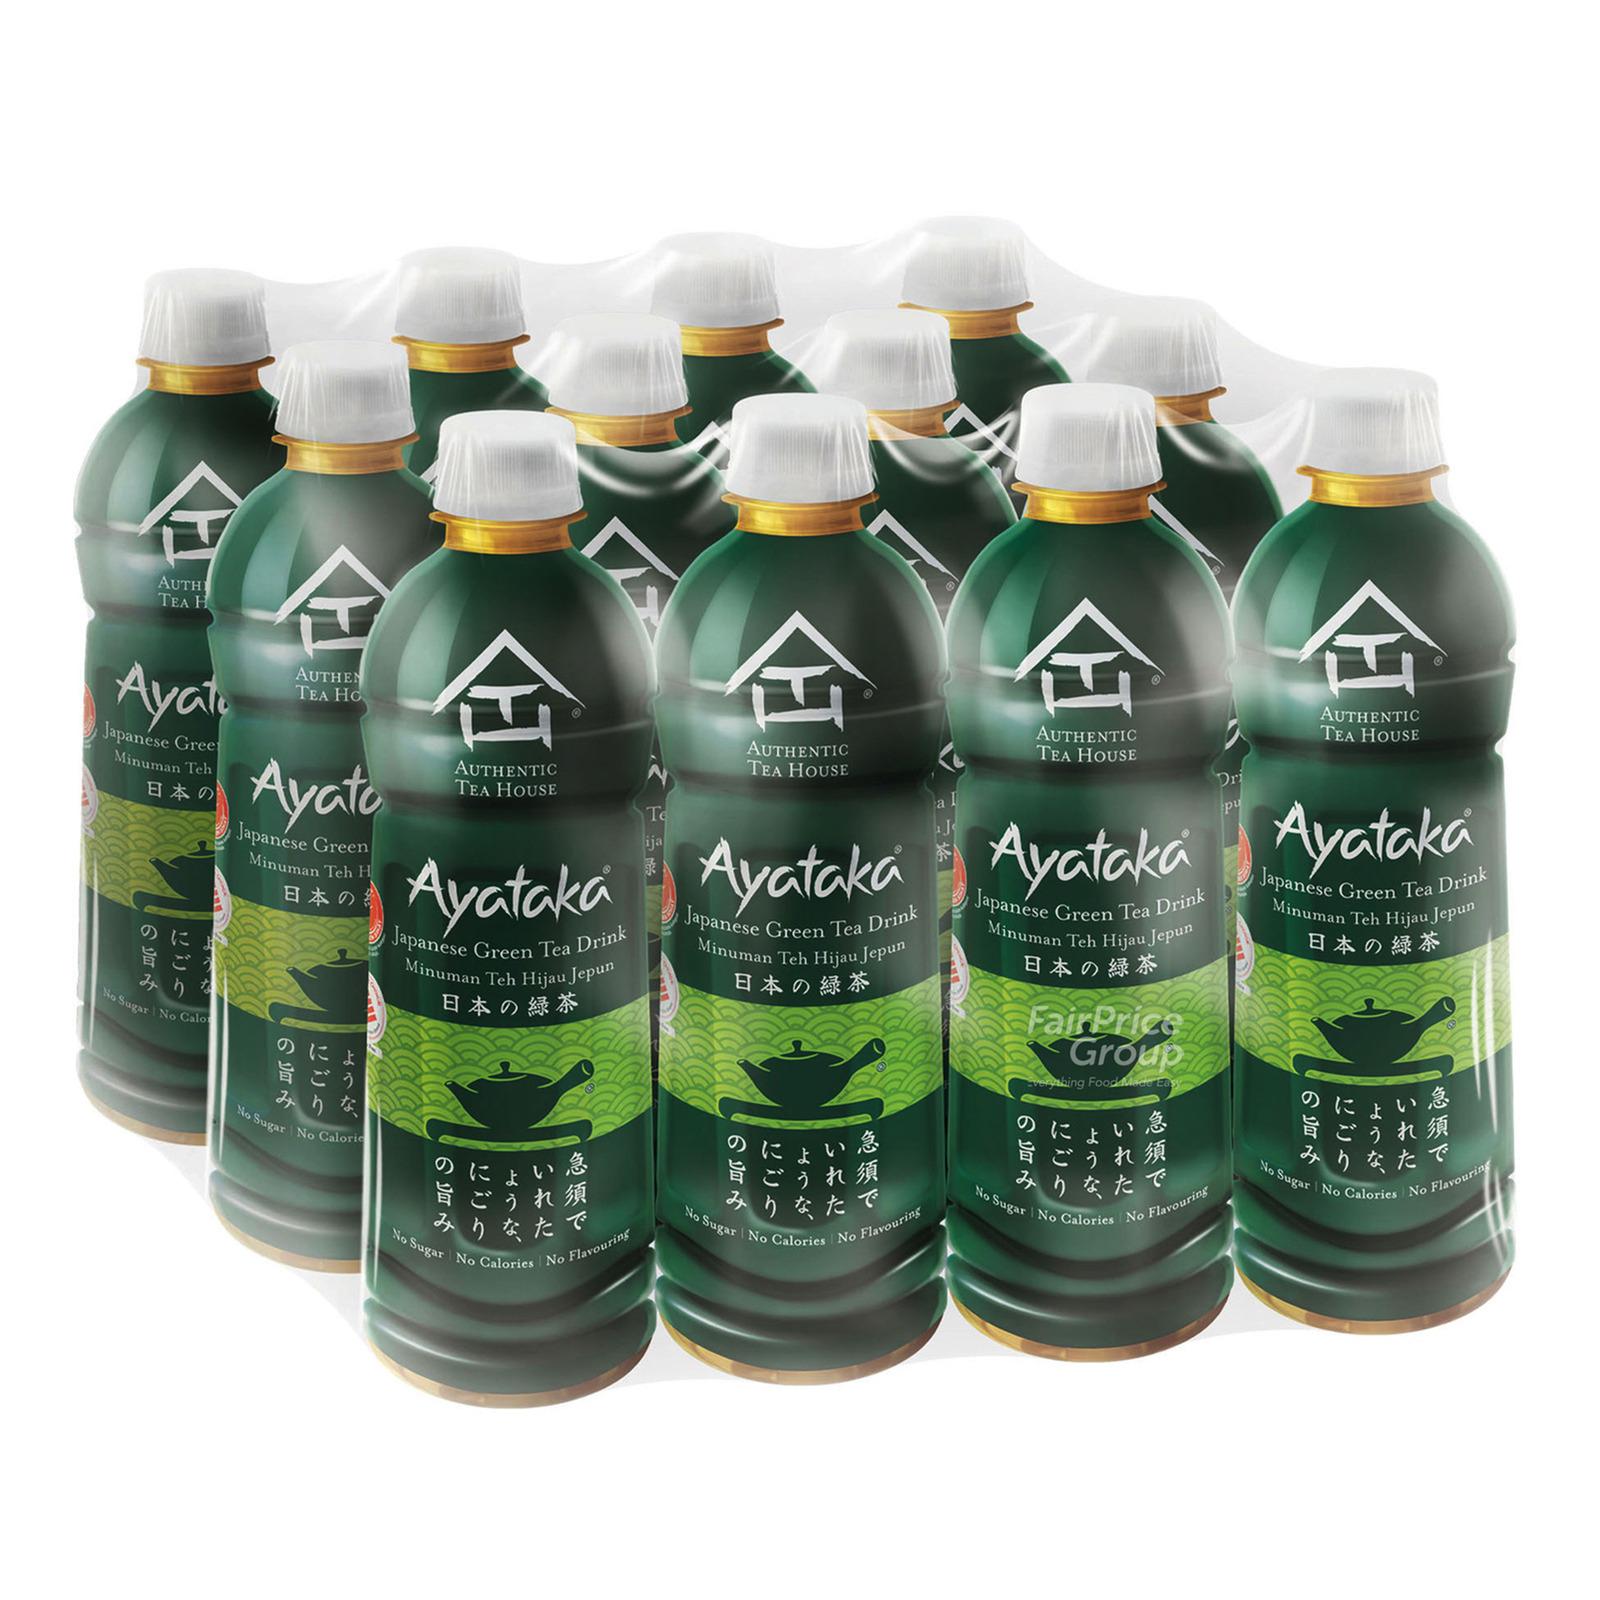 Authentic Tea House Ayataka No Sugar Japanese Green Tea - Case